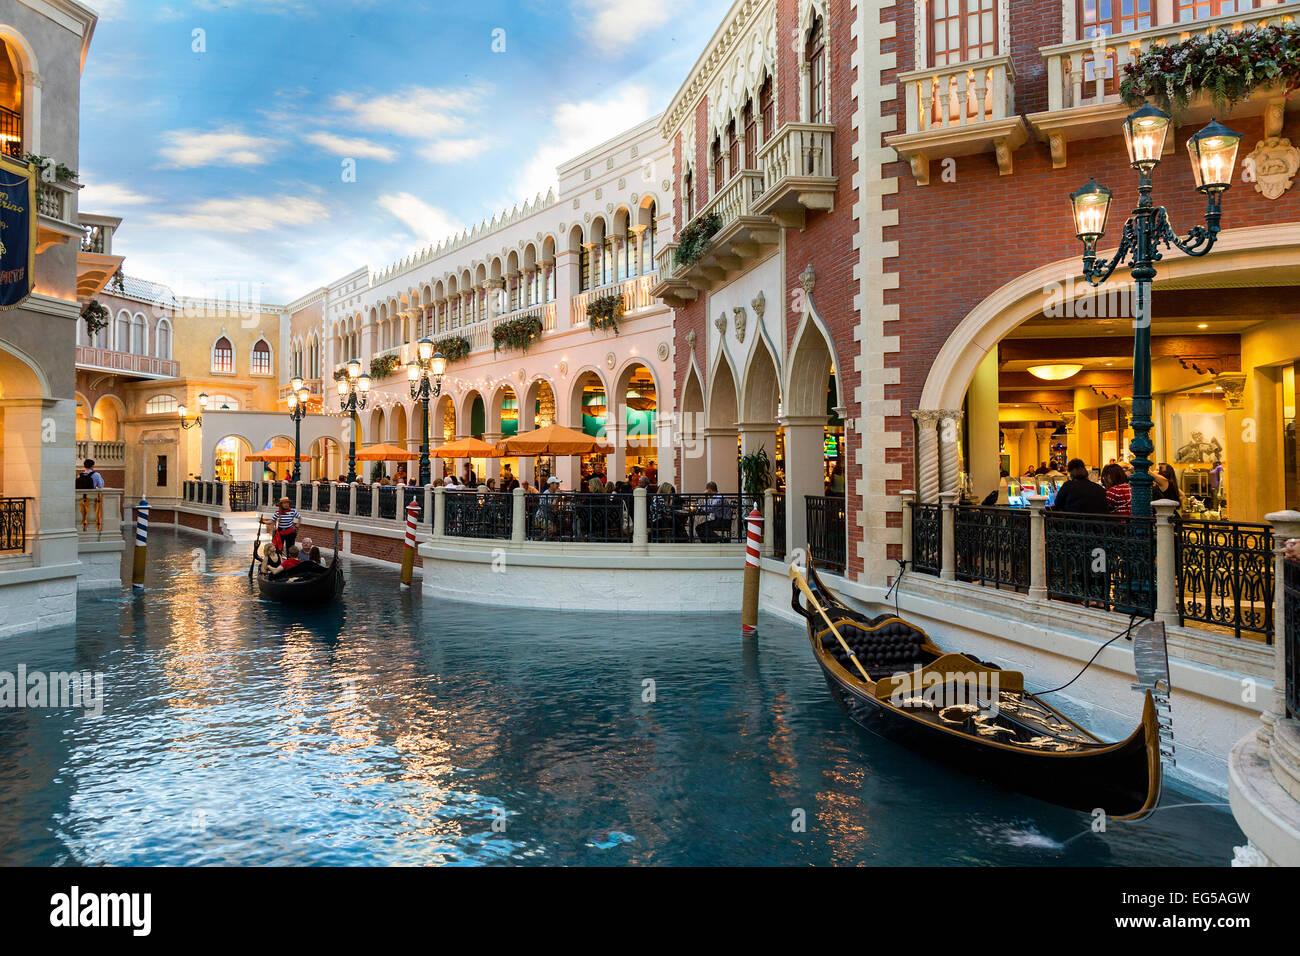 Gondola at The Venetian Hotel, Las Vegas, USA - Stock Image